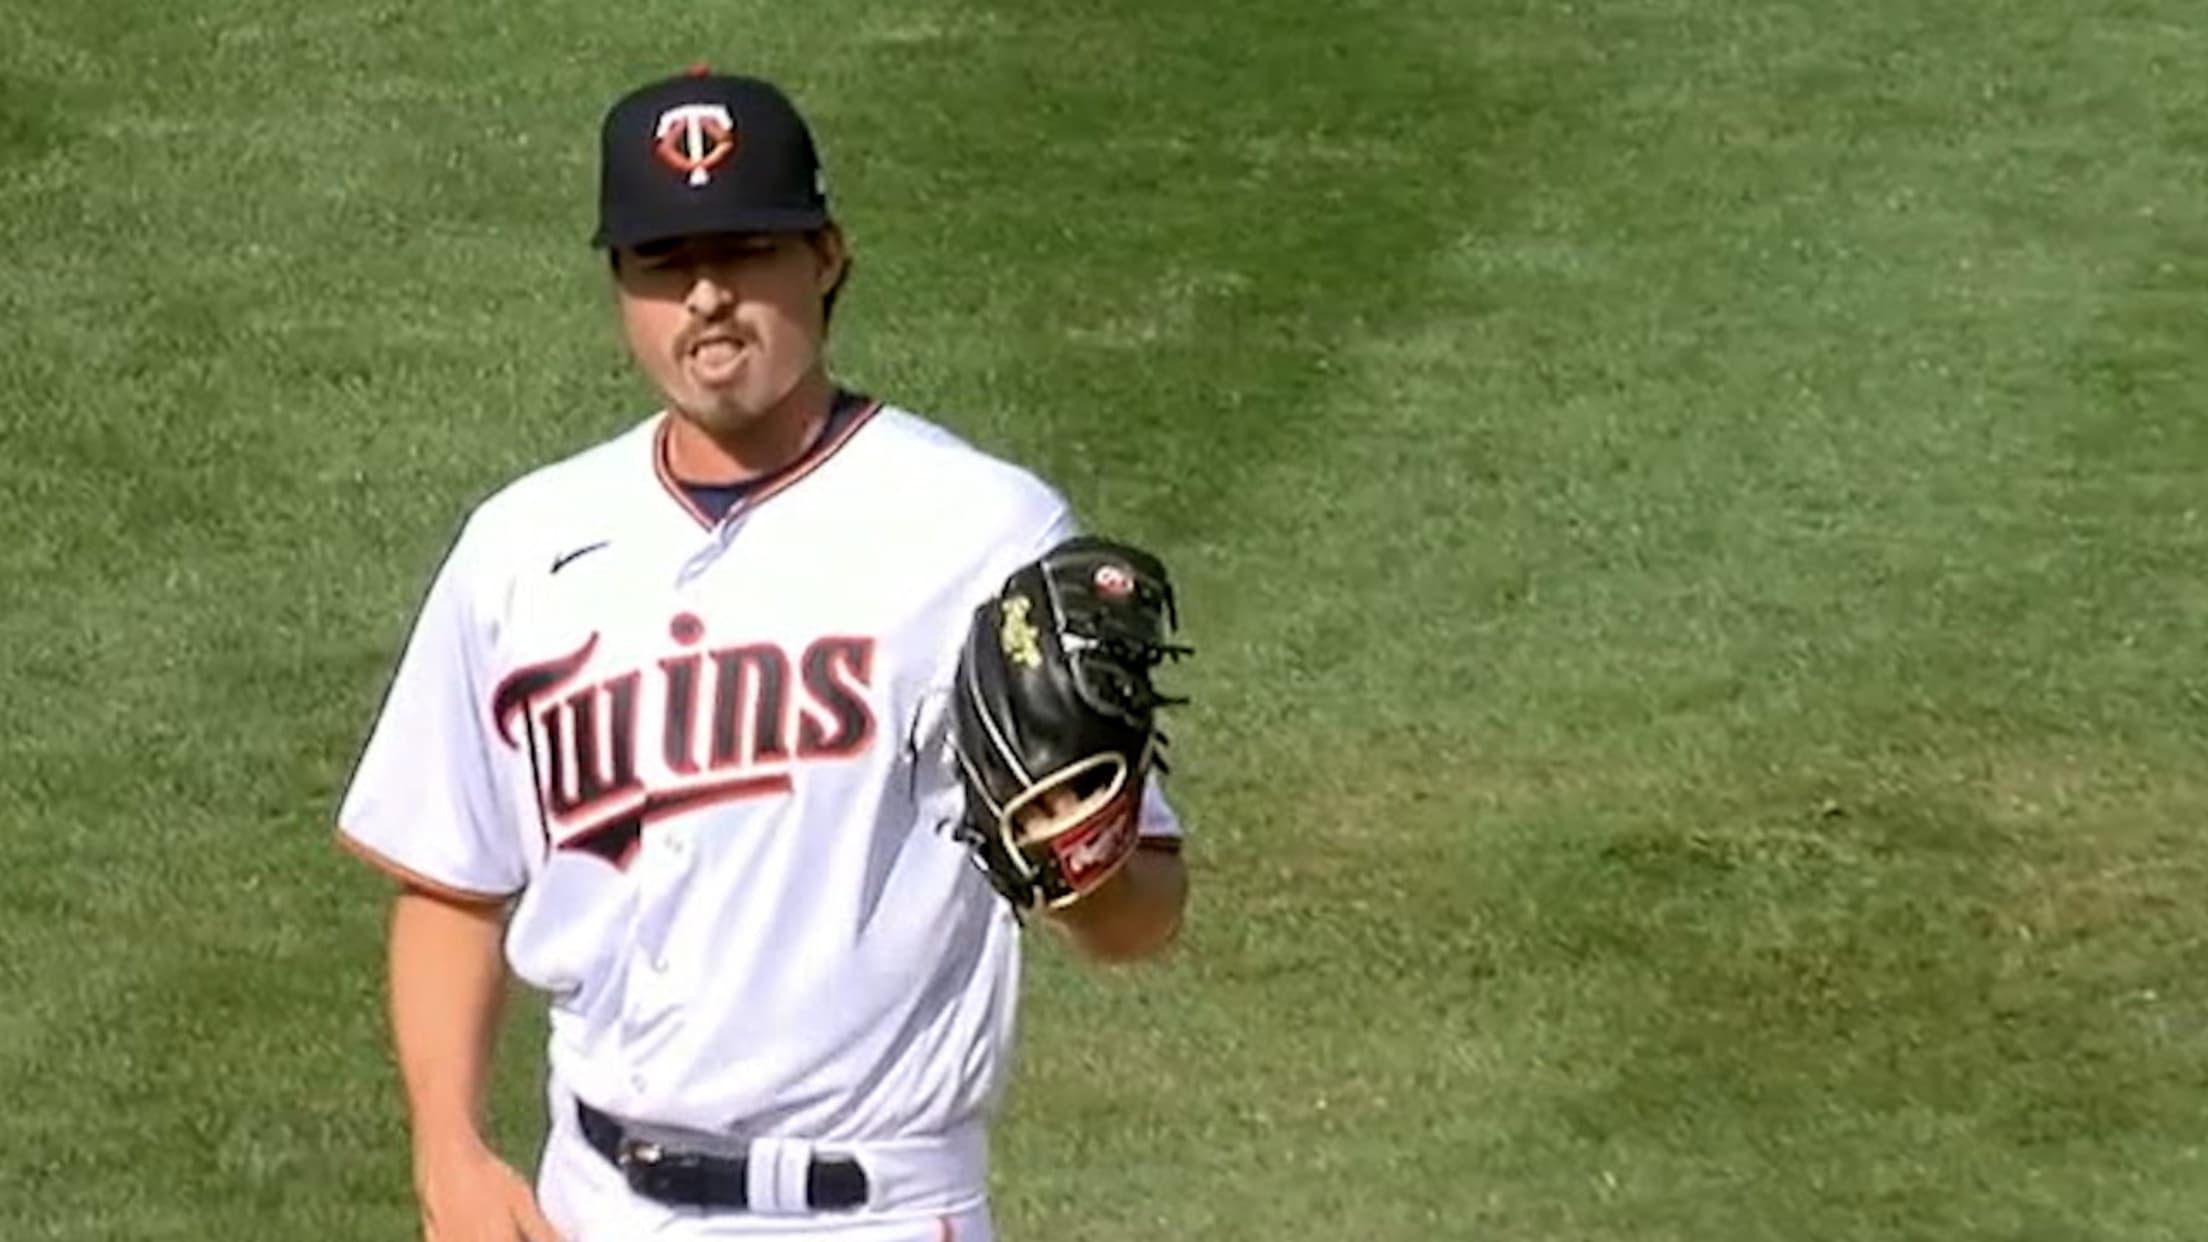 Jordan Balazovic's clean inning